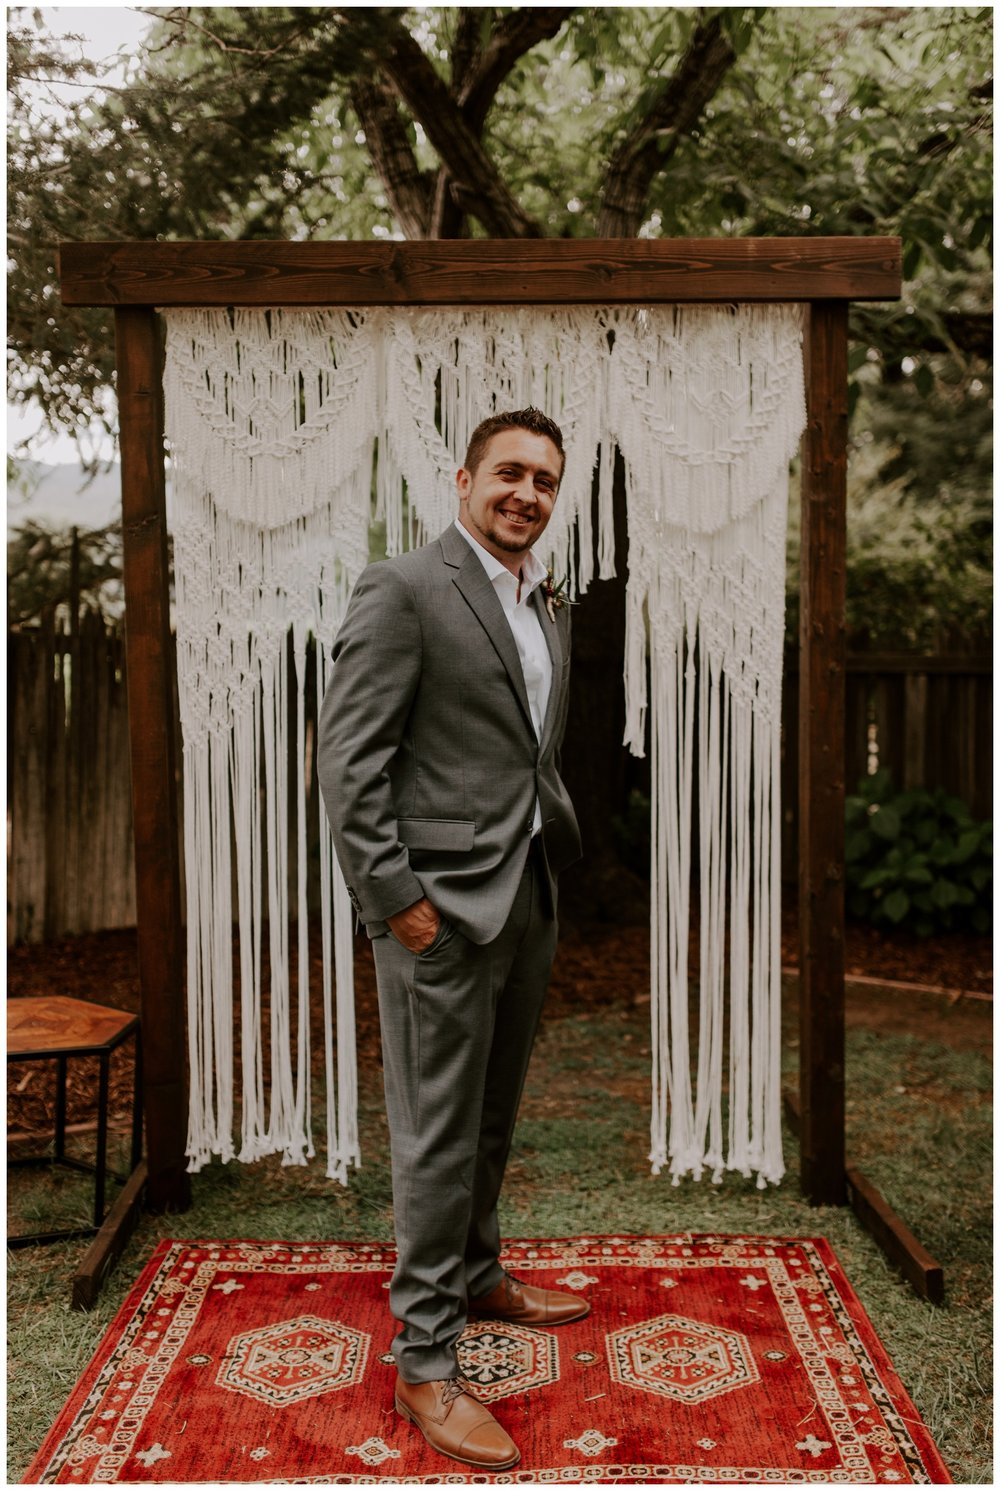 Napa Valley Backyard Wedding and Reception at Elizabeth Spencer Winery | Jessica Heron Images 098.jpg